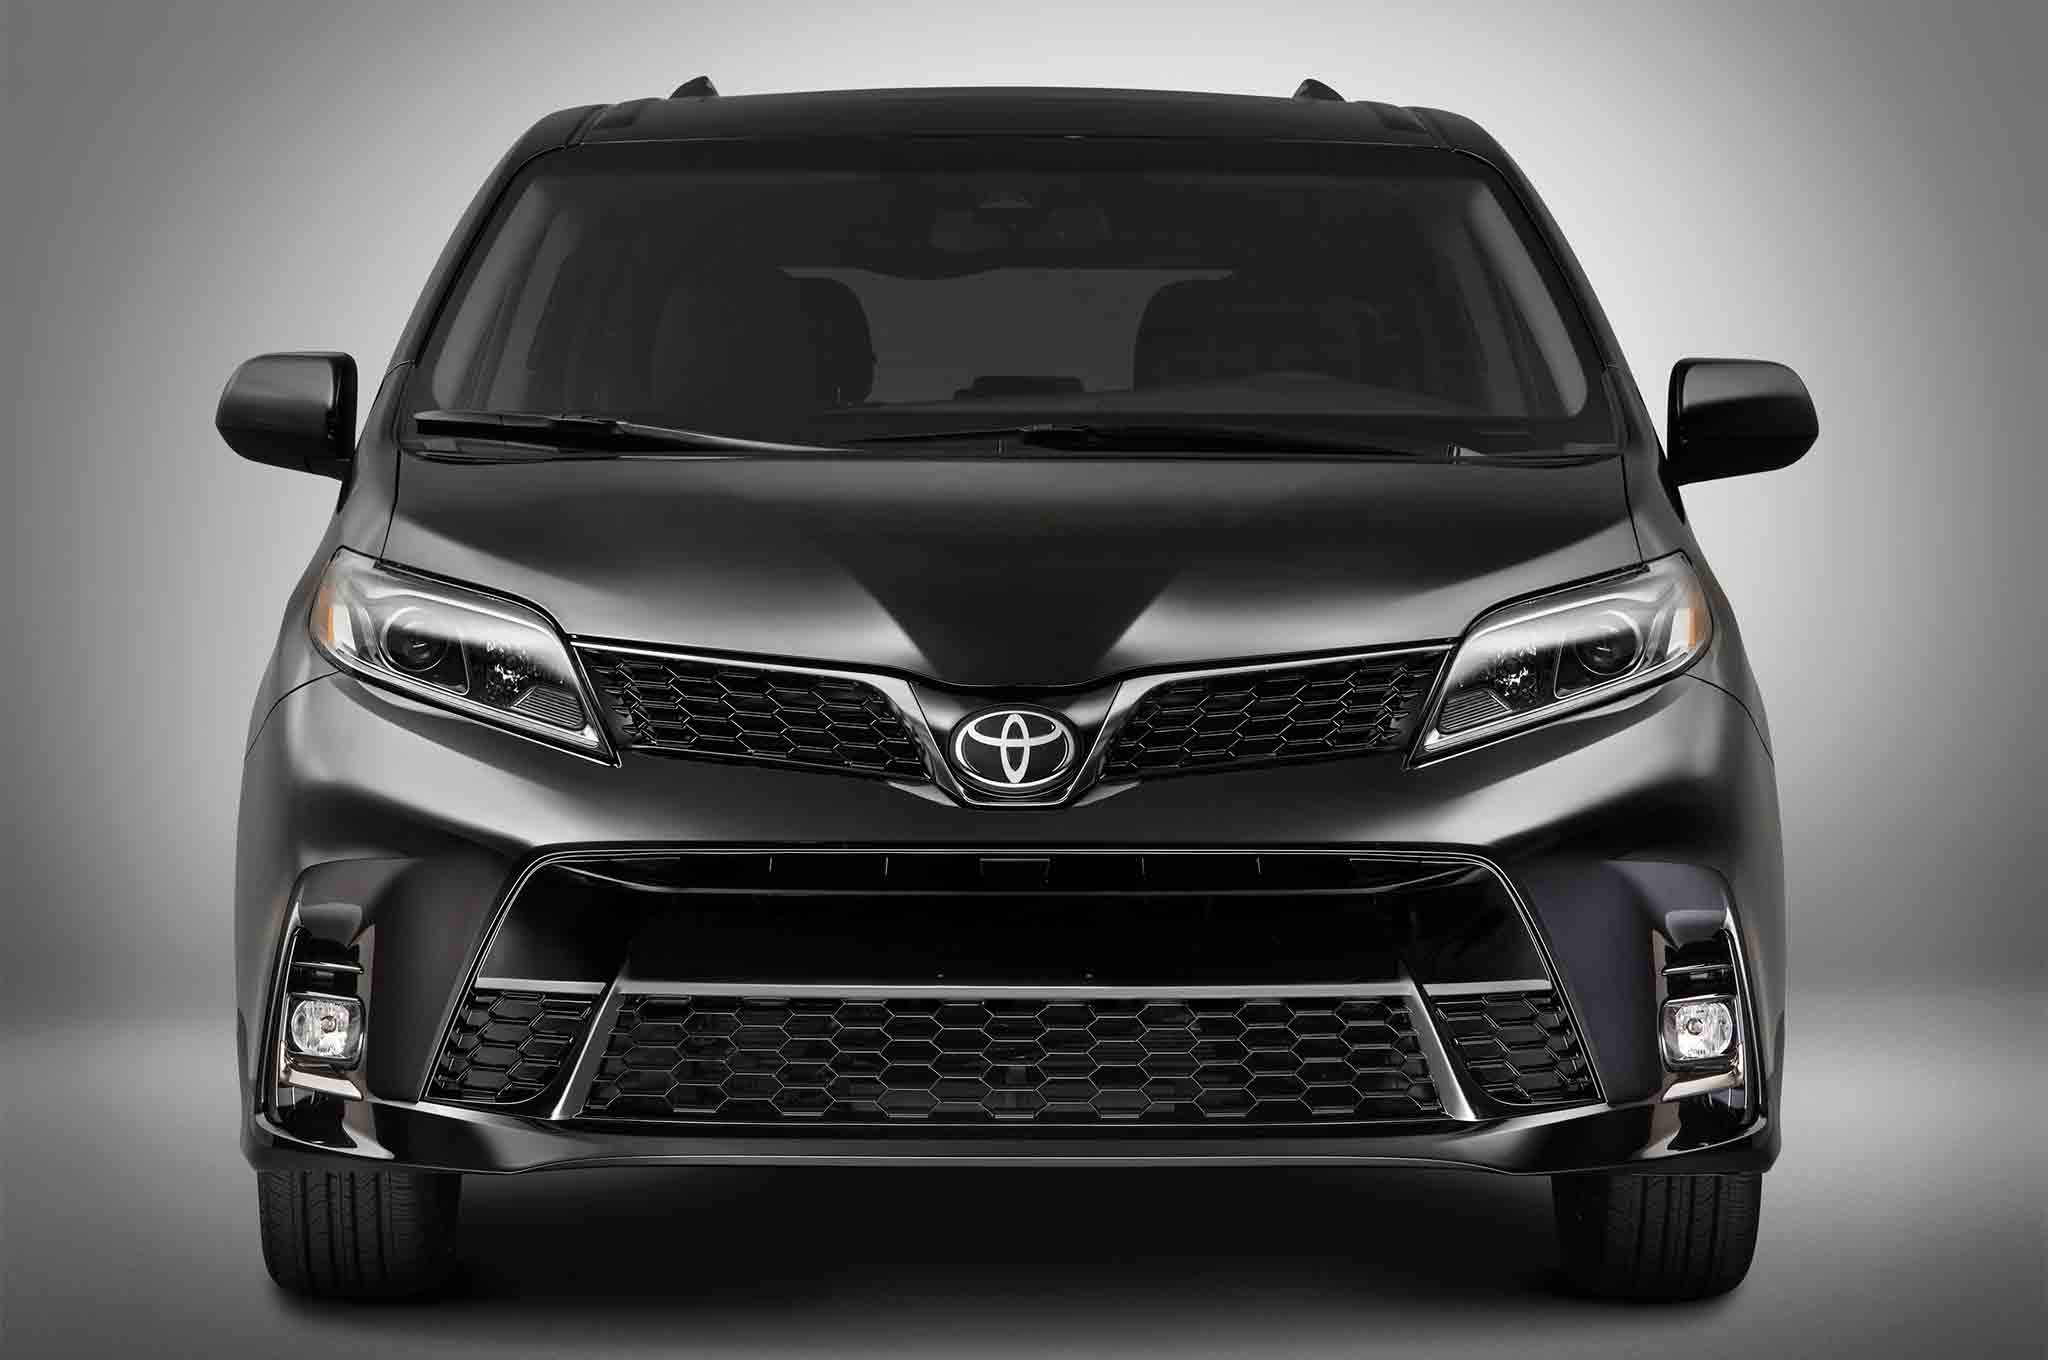 Toyota Van 2018 >> 2018 Toyota Sienna Receives a Fresh Look | Automobile Magazine